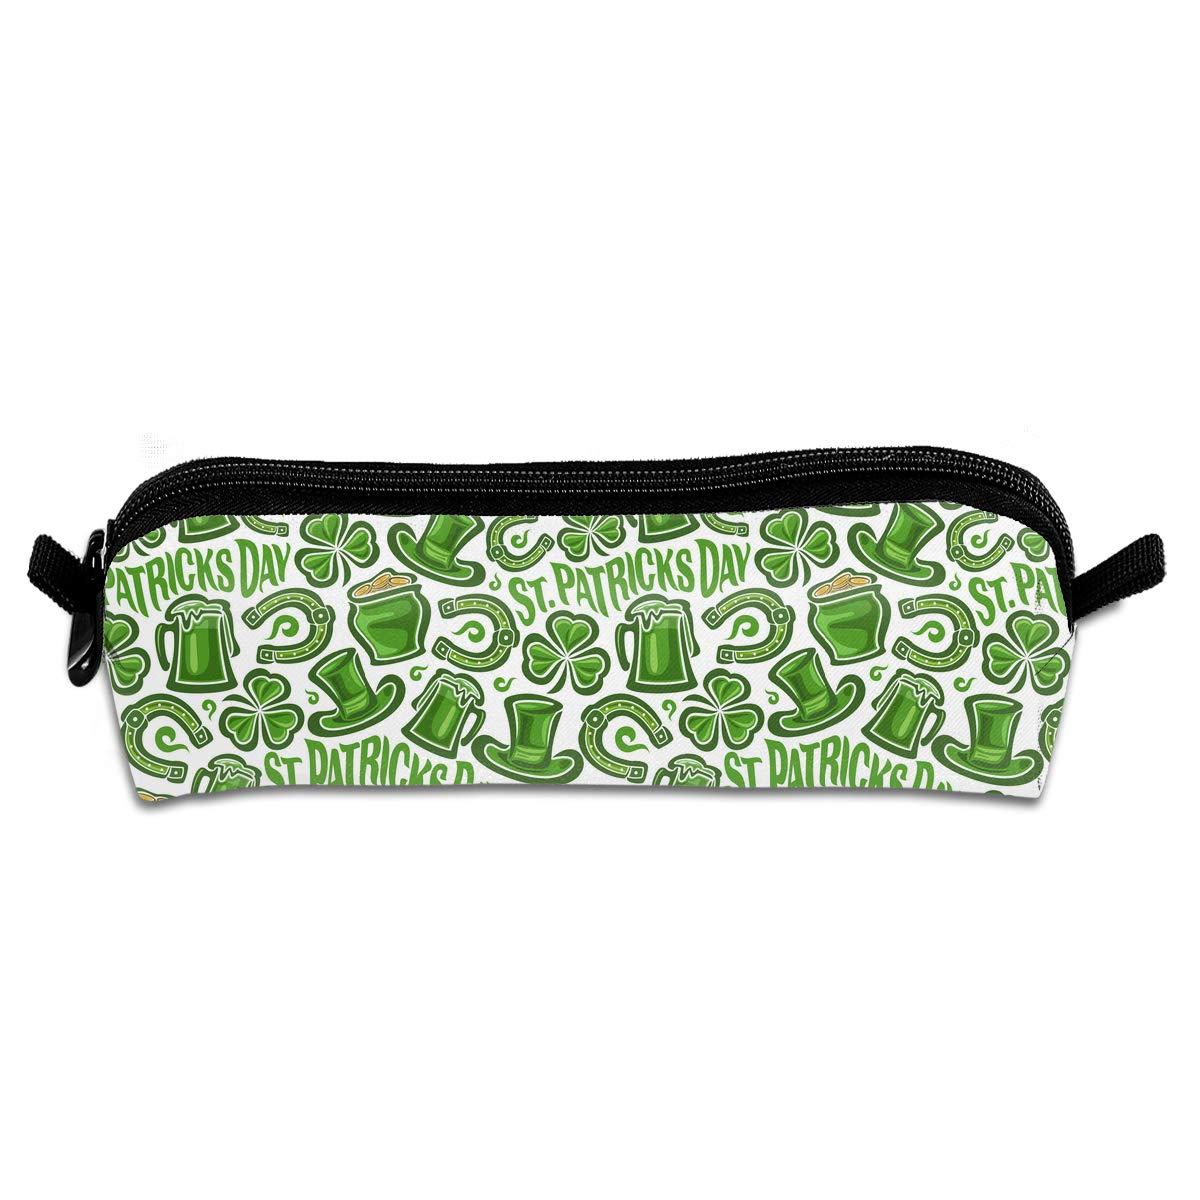 EWFBVa Durable Zipper Stationery Bag St. Patrick